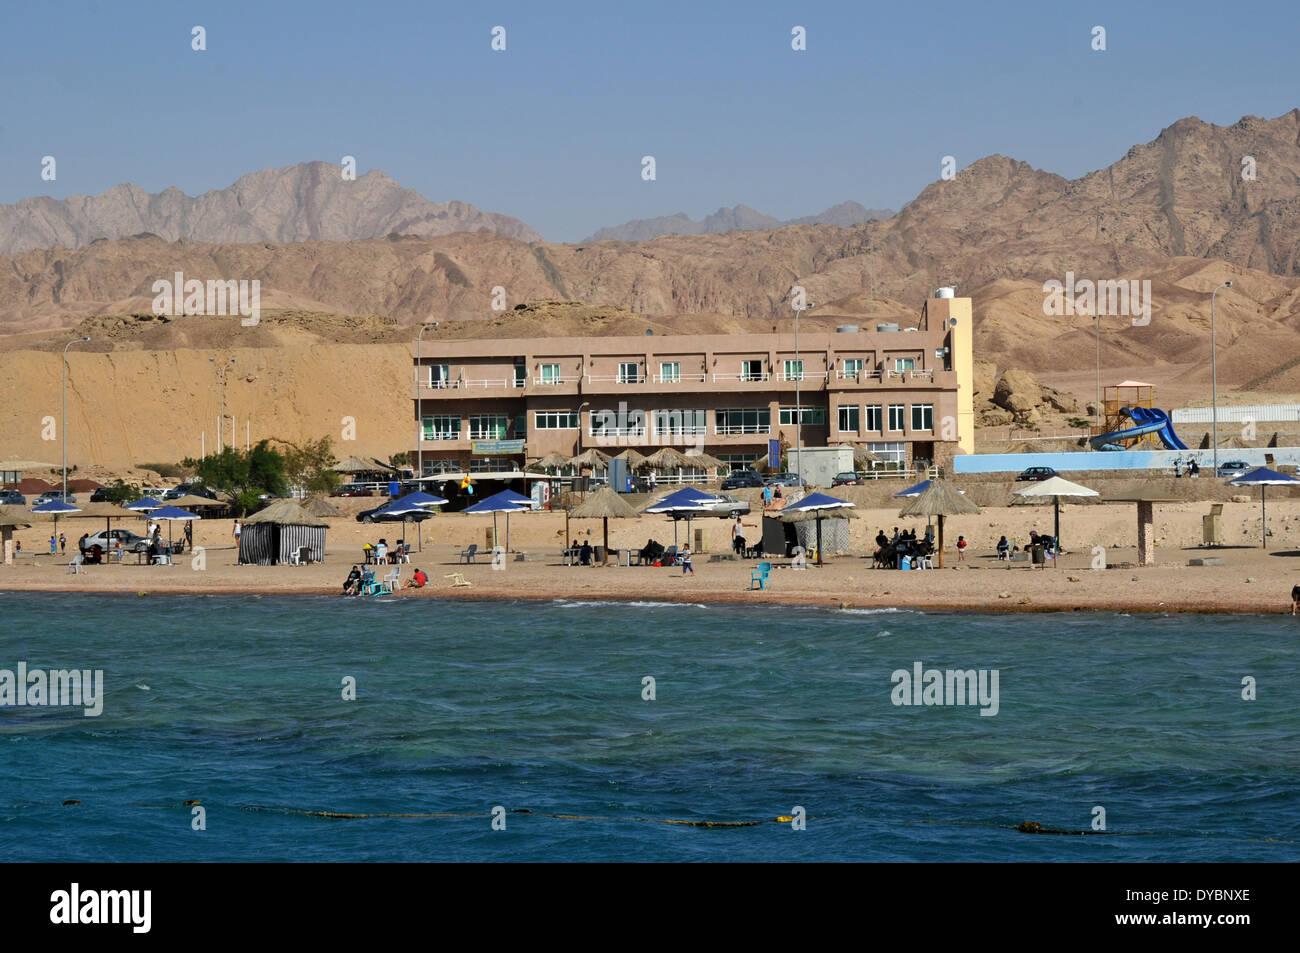 Resort near the coast, Gulf of Aqaba, Red Sea, Jordan Stock Photo